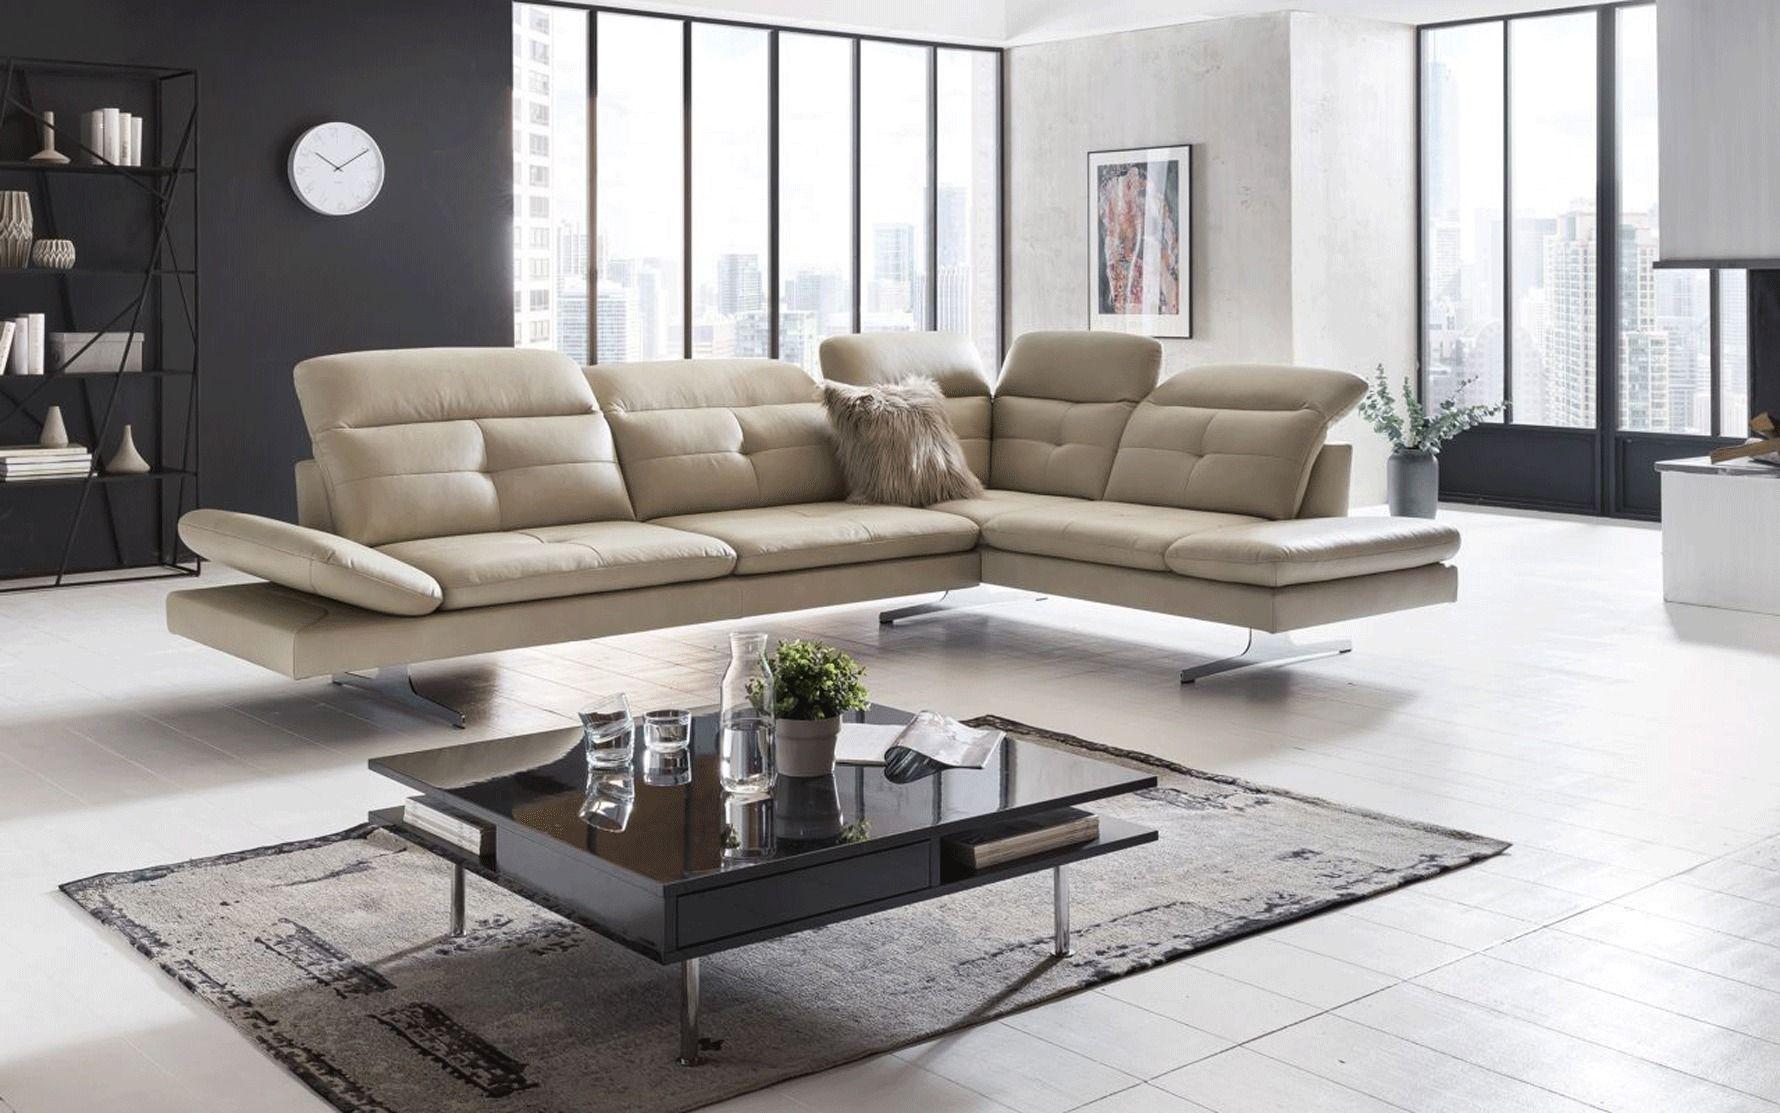 Wholesale Modern Furniture Furniture Furniture Design Comfortable Furniture